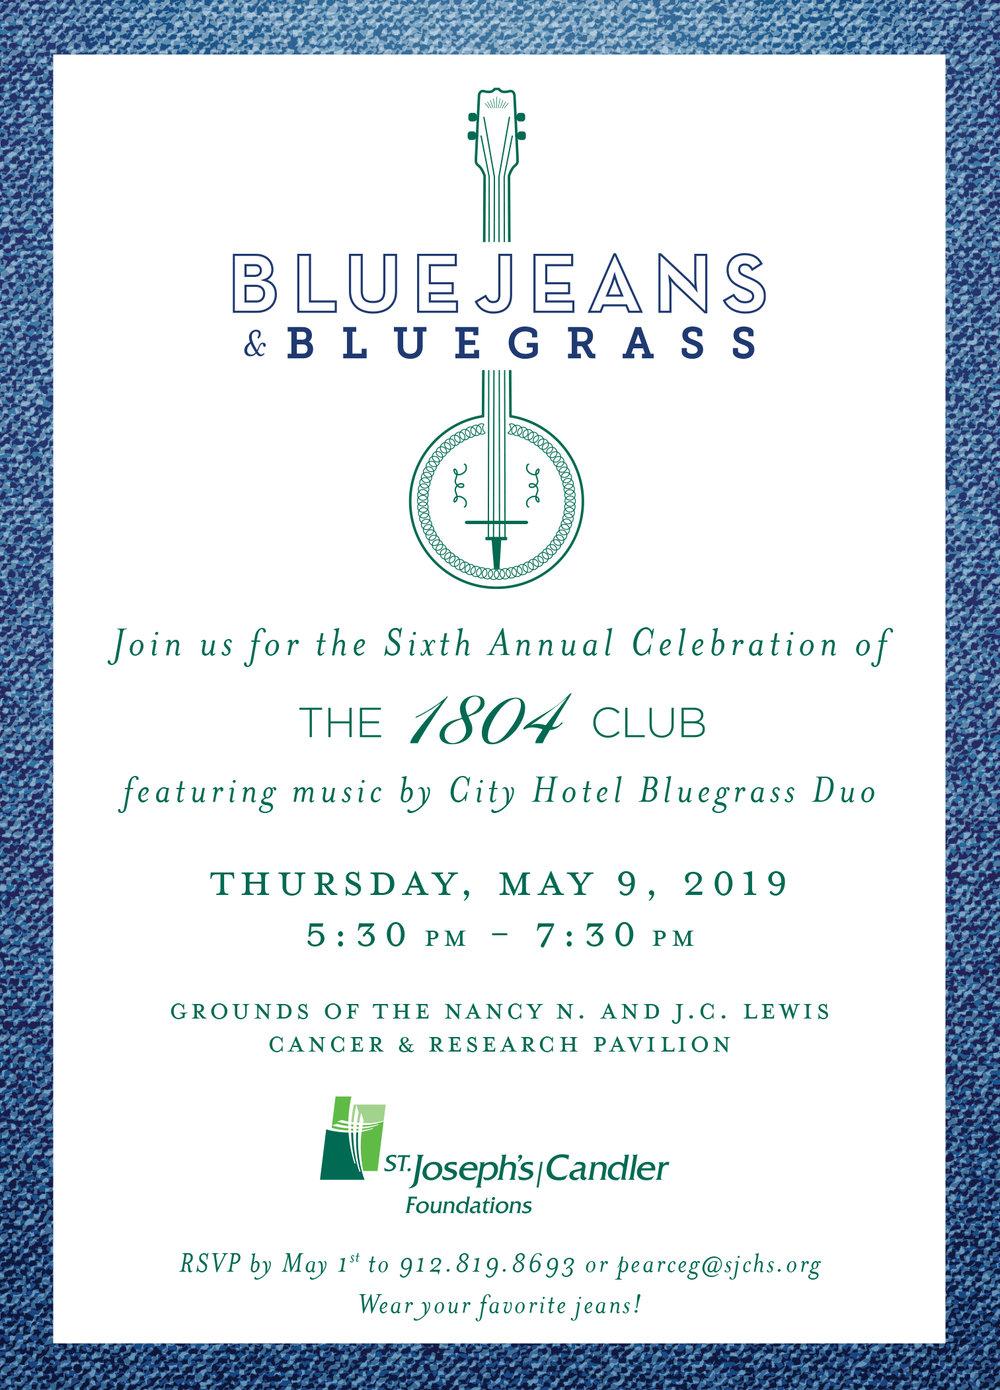 1804 Bluejeans & Bluegrass invitation-1.jpg